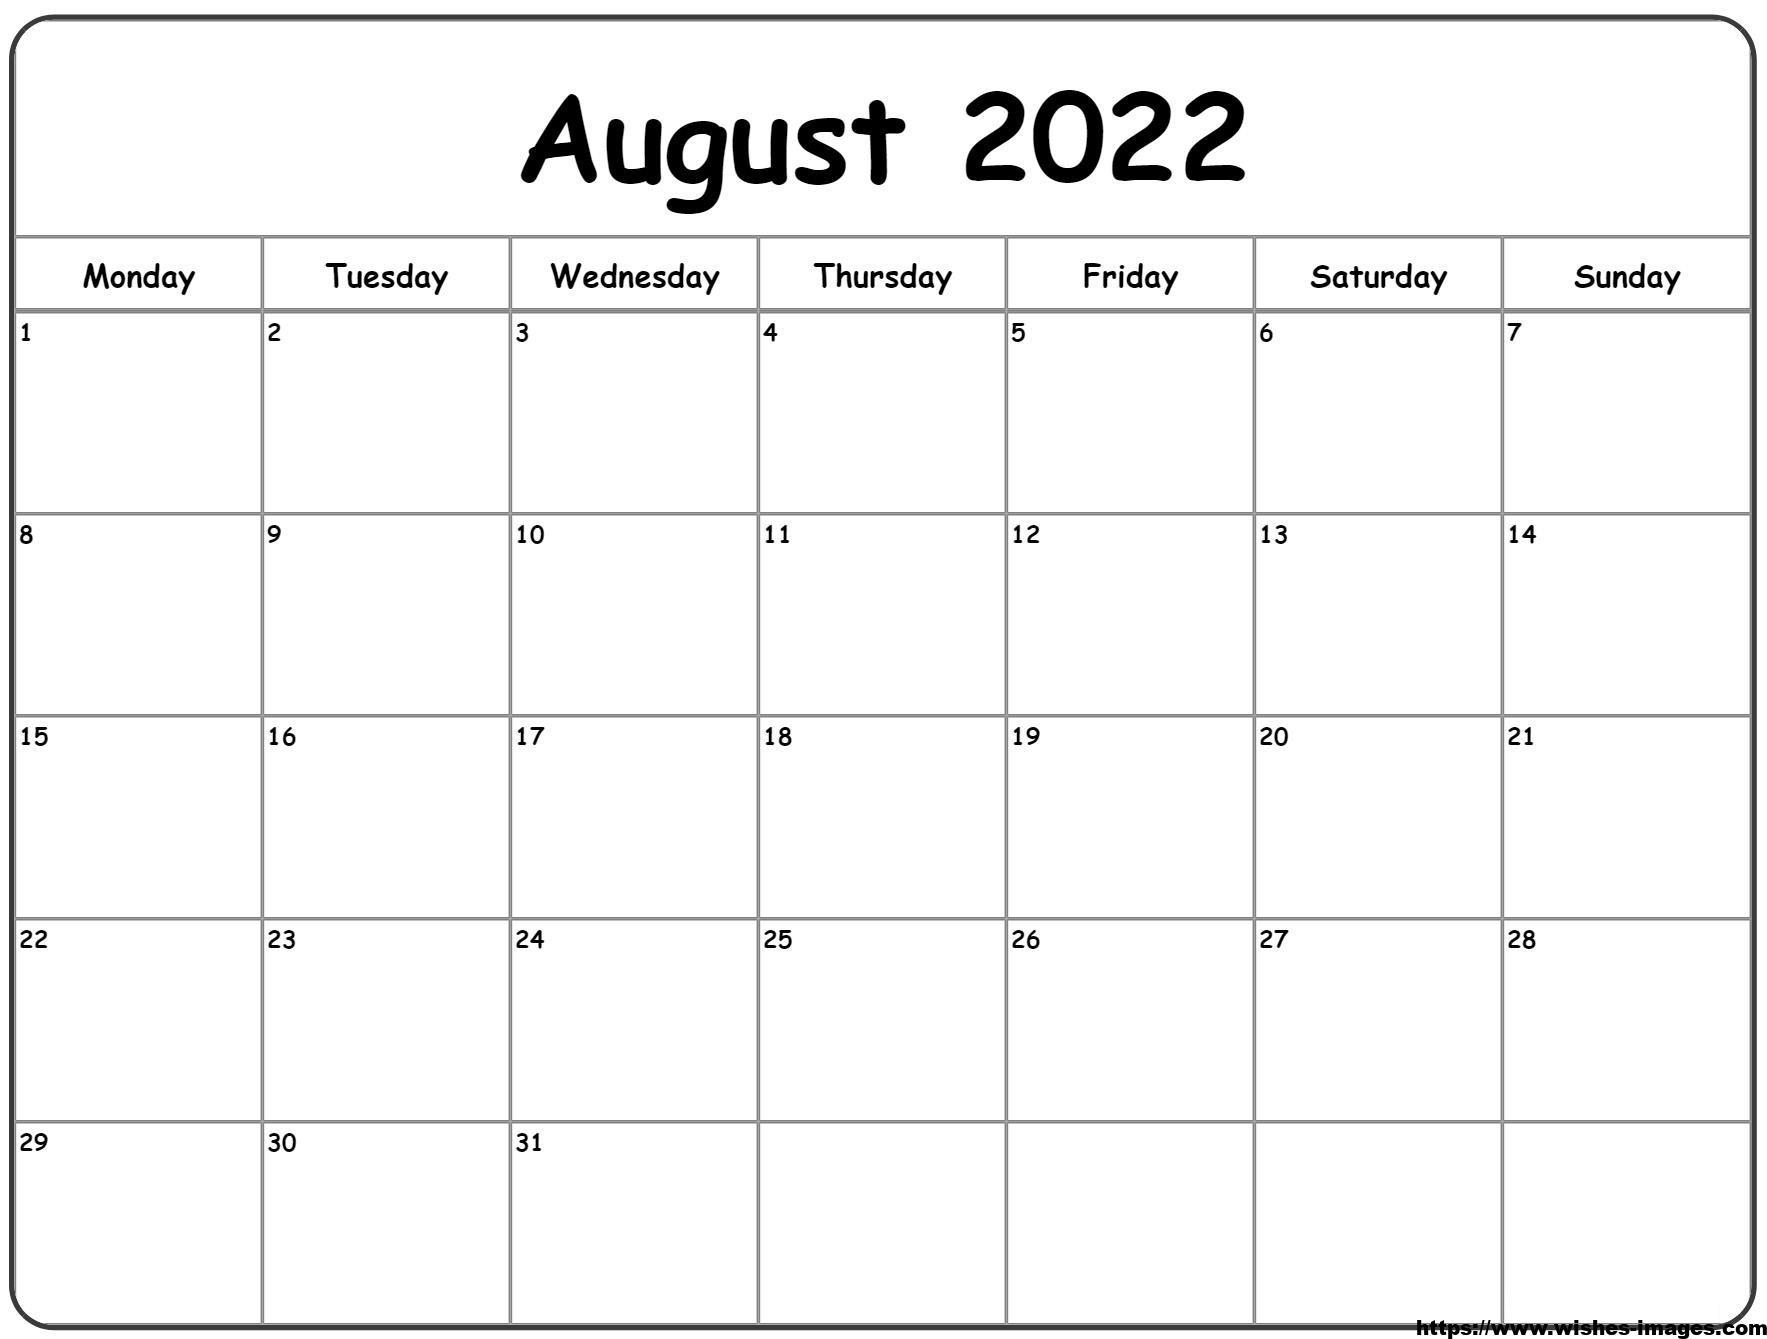 2021 and 2022 school calendar excel